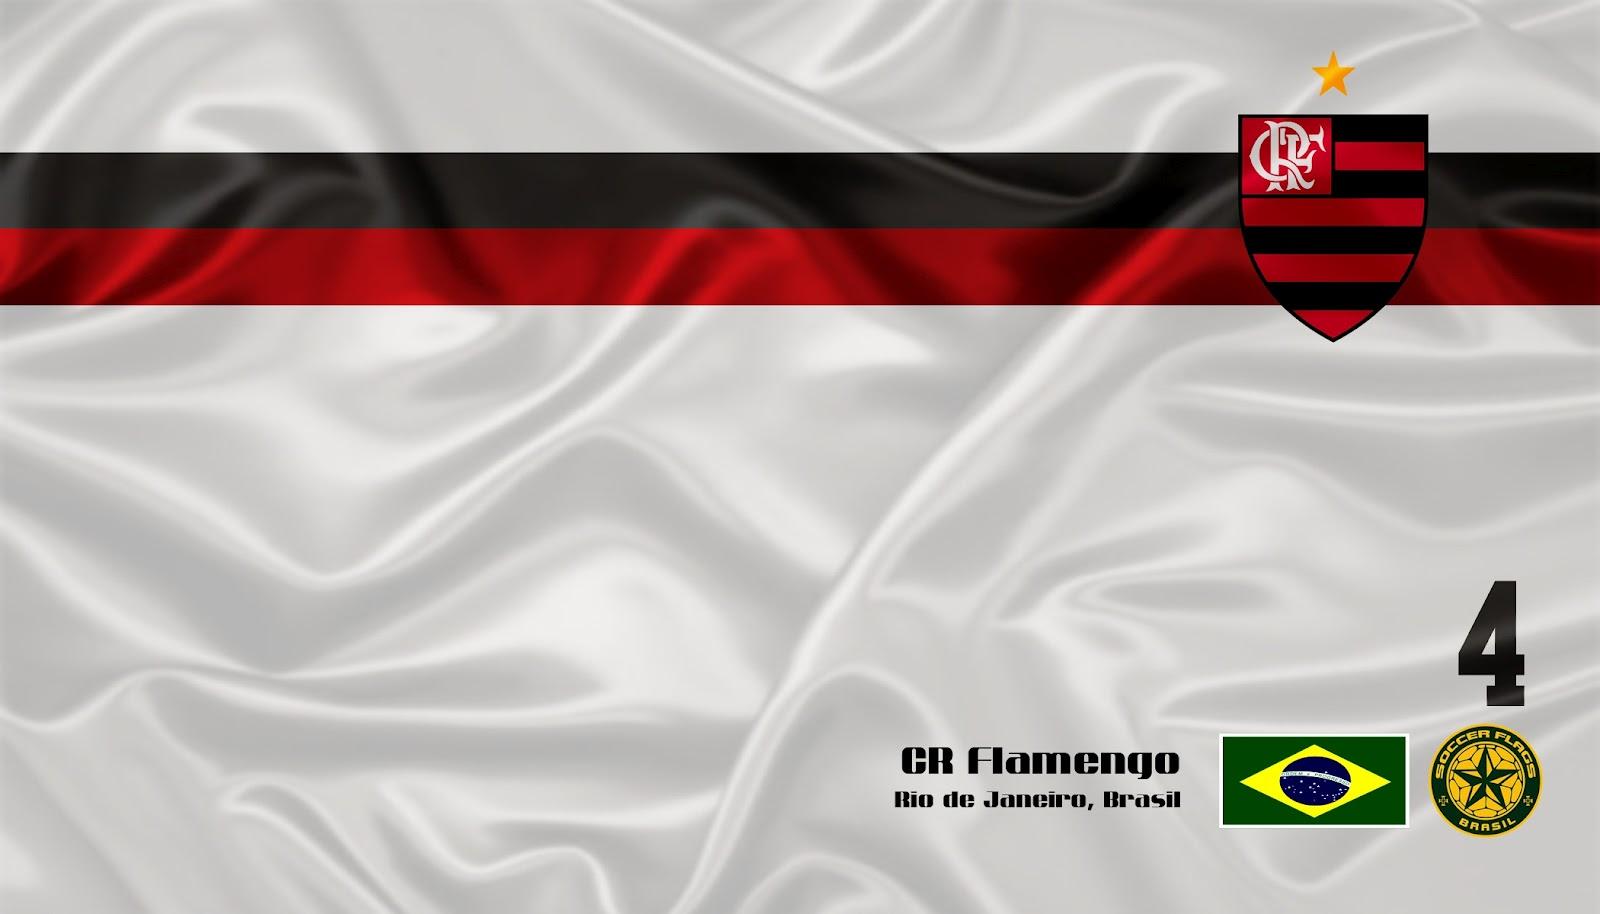 http://4.bp.blogspot.com/-W_jykowEXk8/UCpoMy0a3iI/AAAAAAAACco/Wxpn930WoO4/s1600/Flamengo+(5).jpg